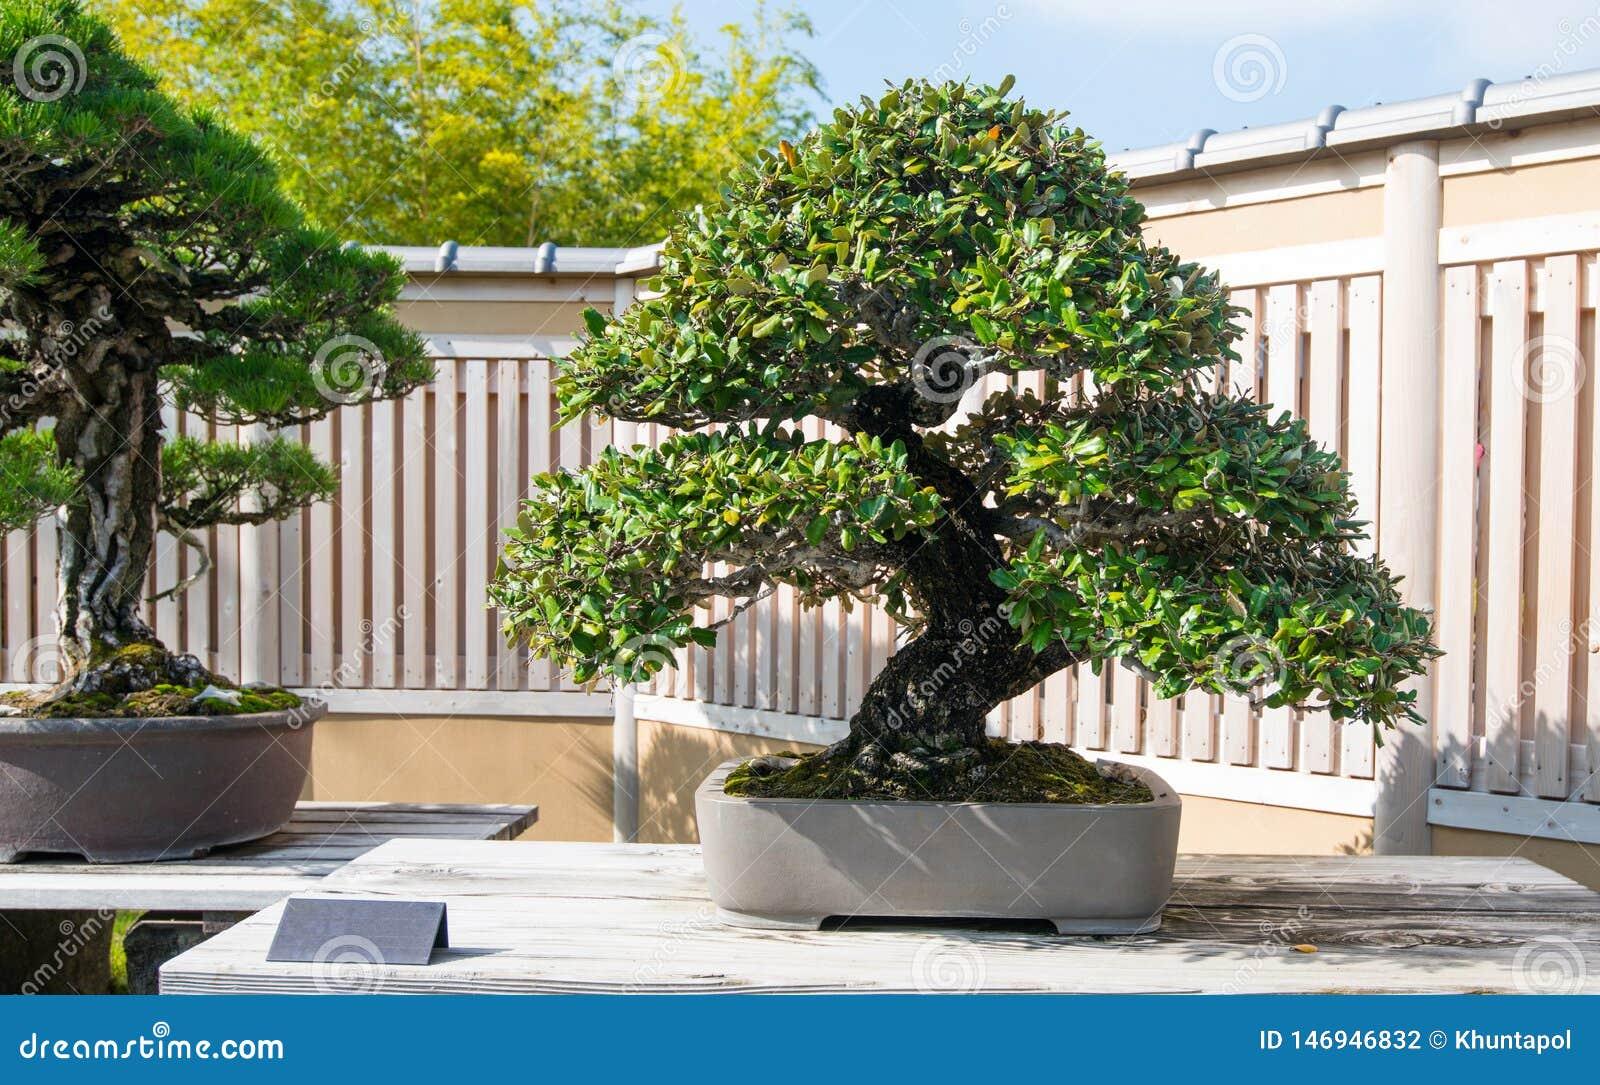 Japanese Oleaster Bonsai Tree In Omiya Bonsai Village Stock Photo Image Of Leaf Gardening 146946832